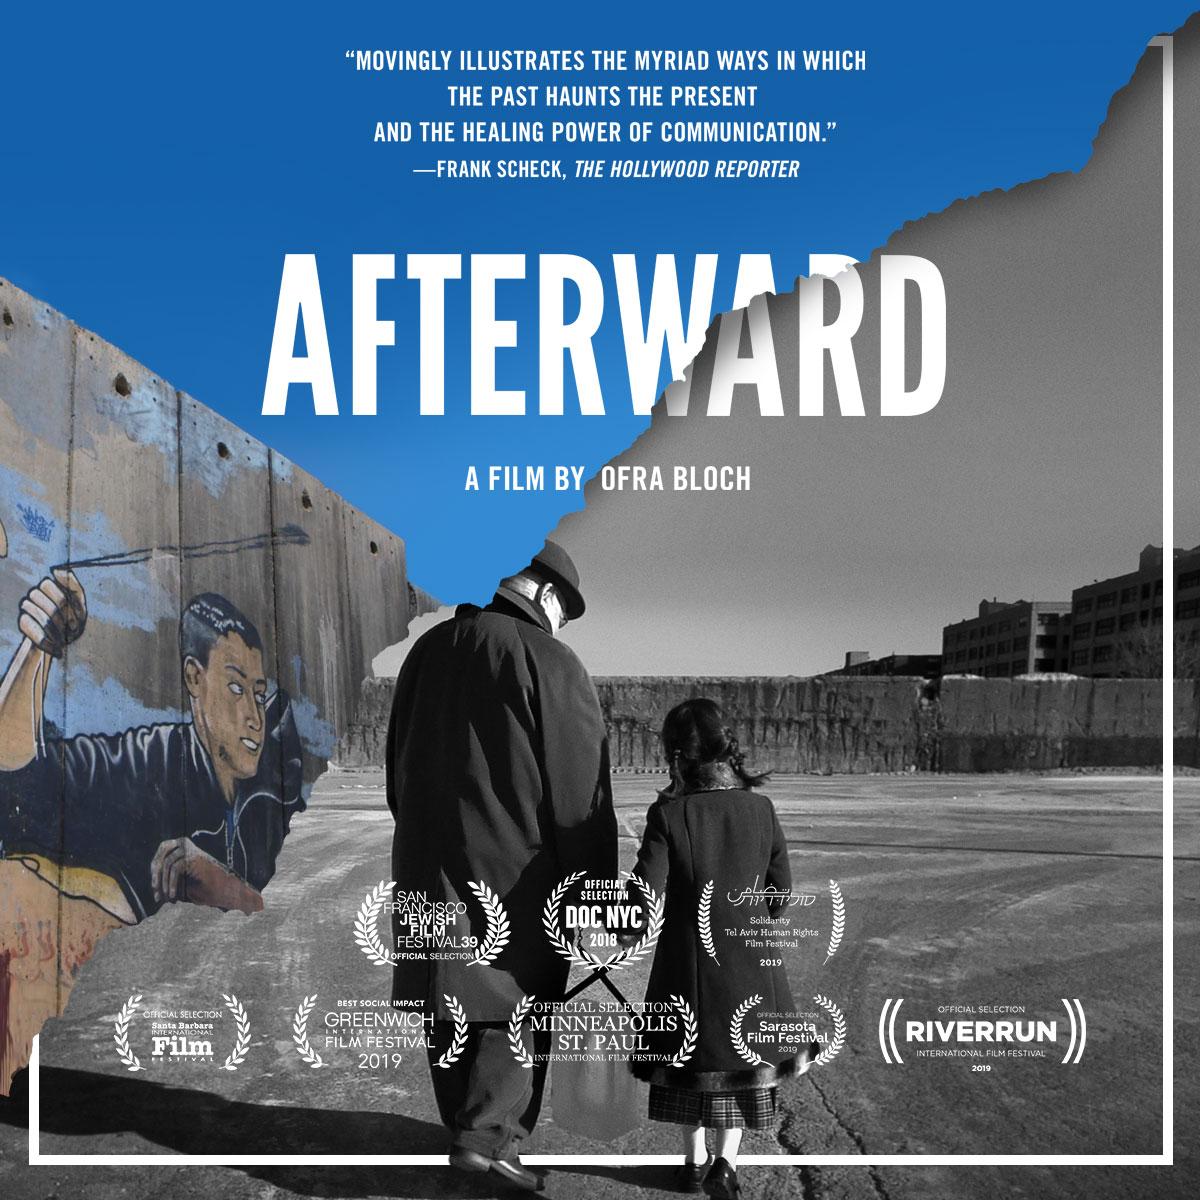 Afterward_1200x1200-1.png